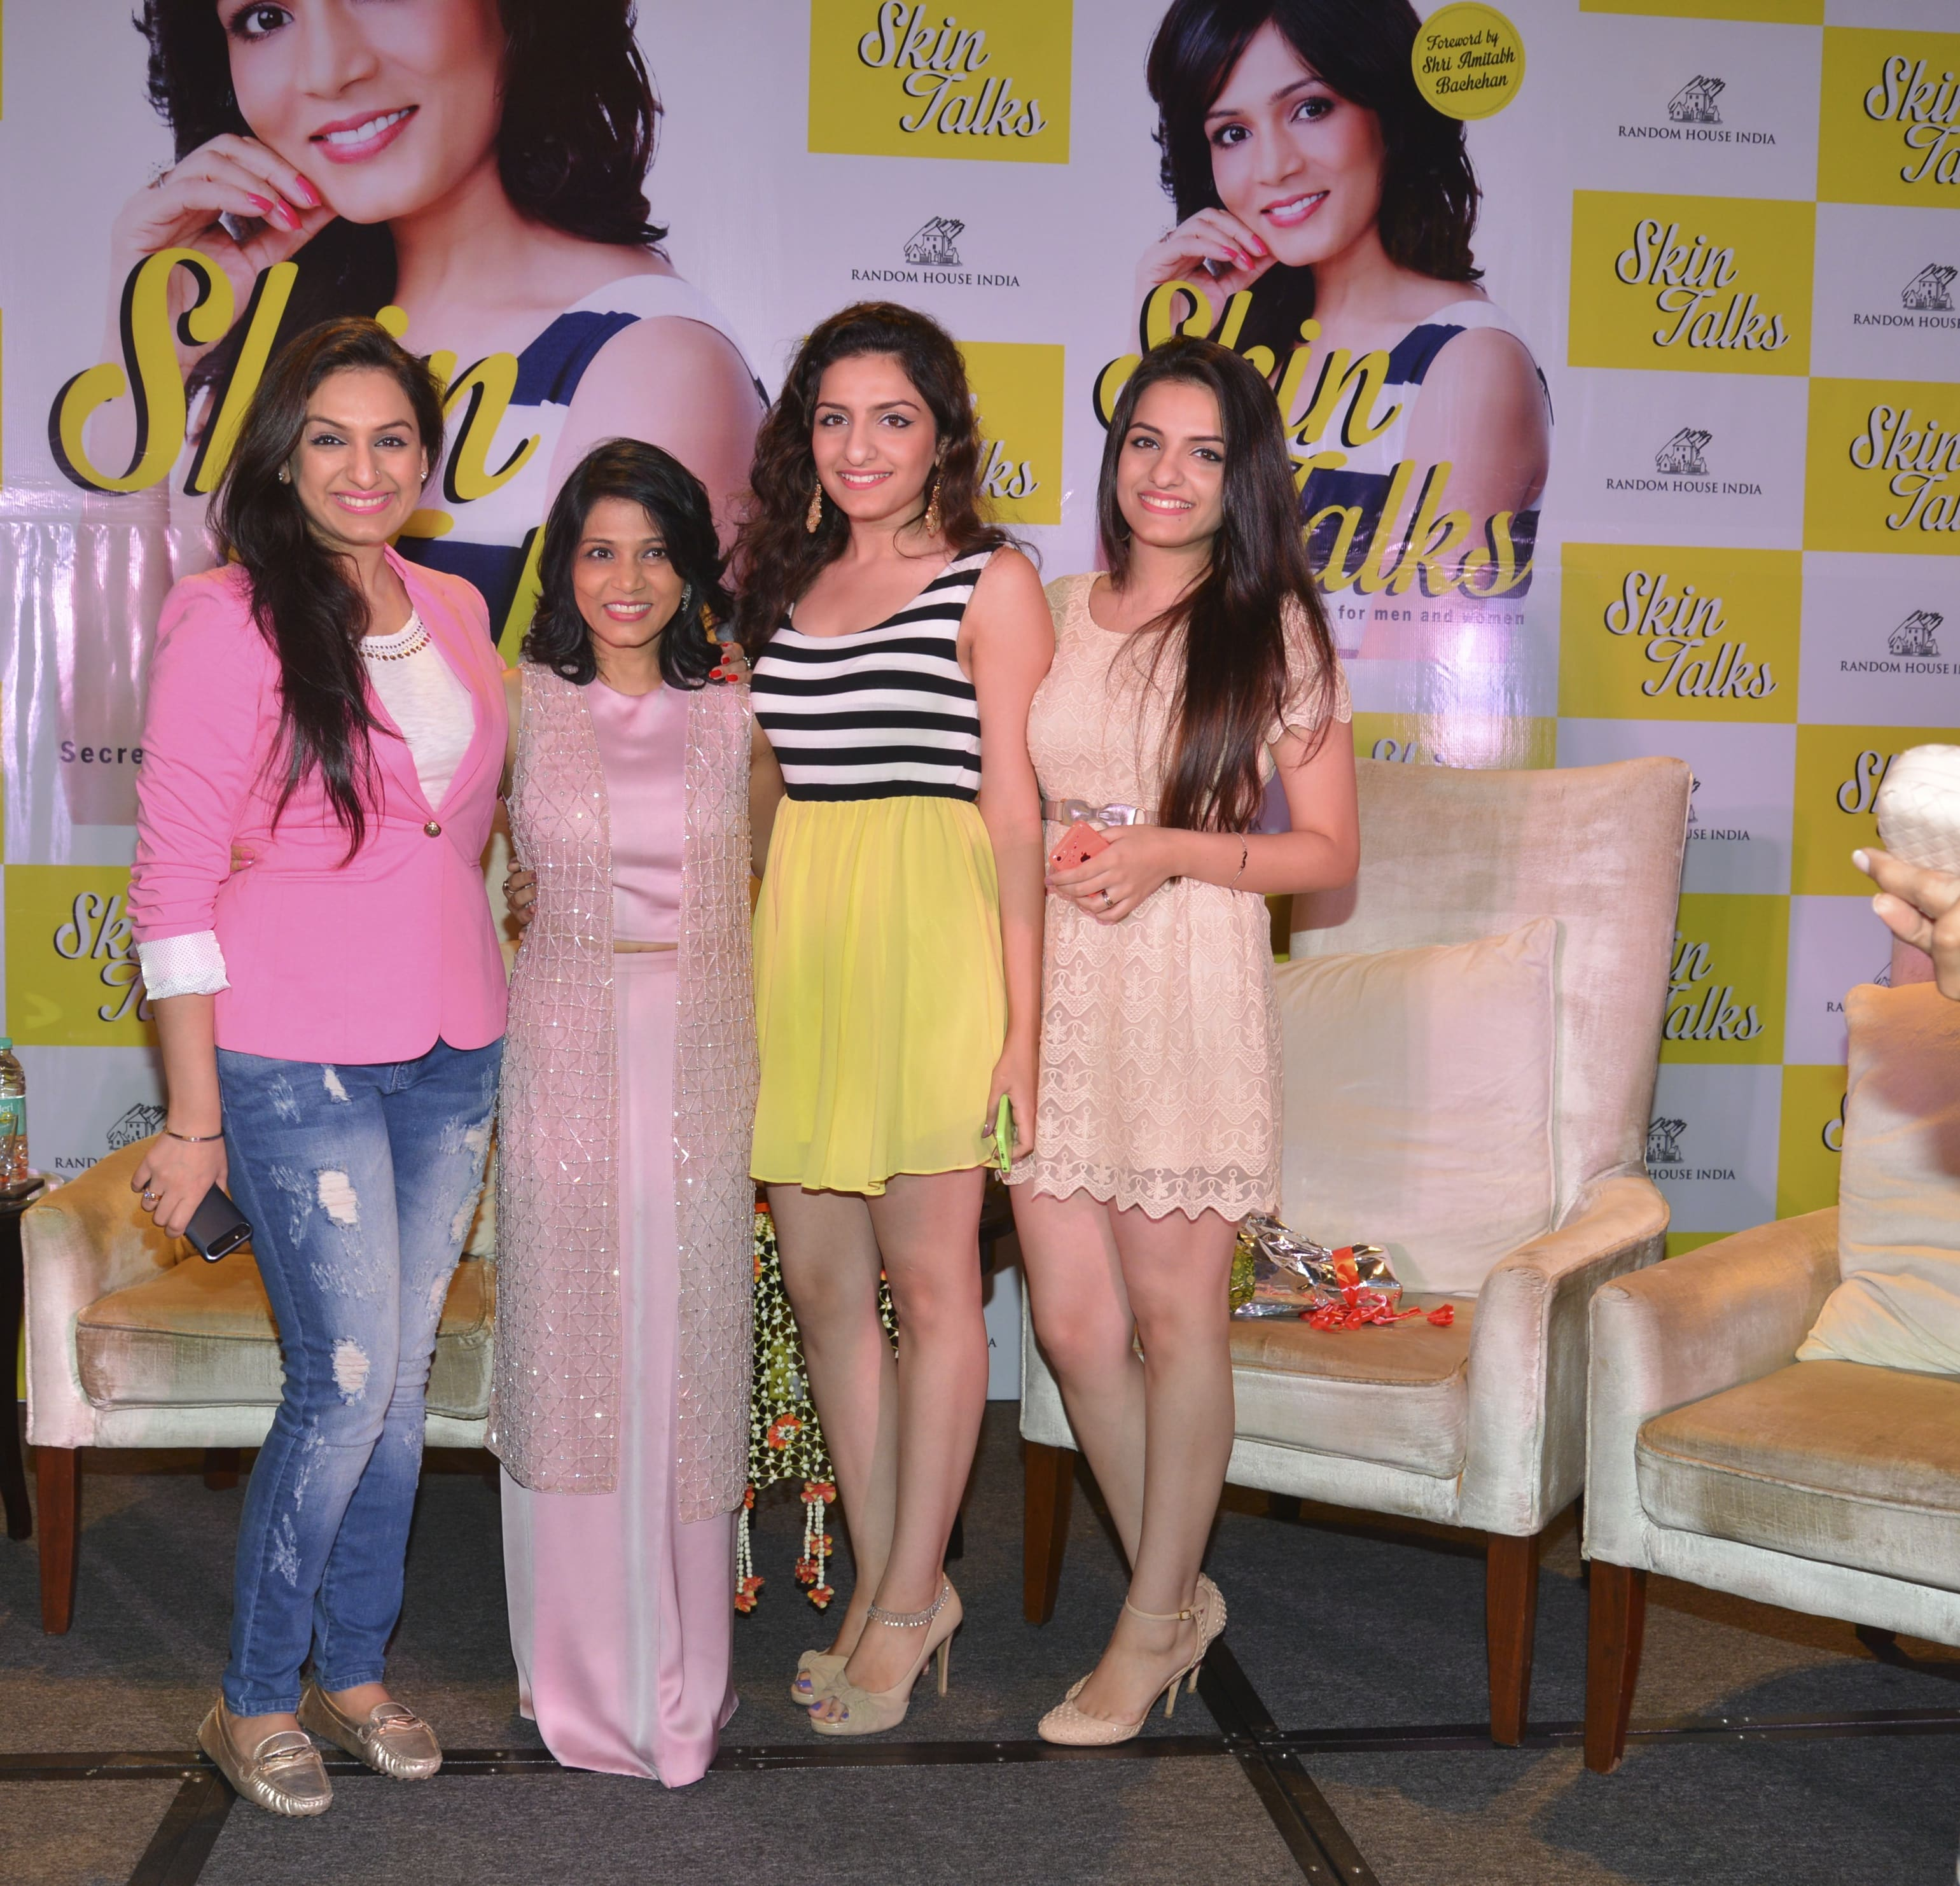 With Akriti, Sukriti and PrakritiKakar the lovely singers from Bollywood